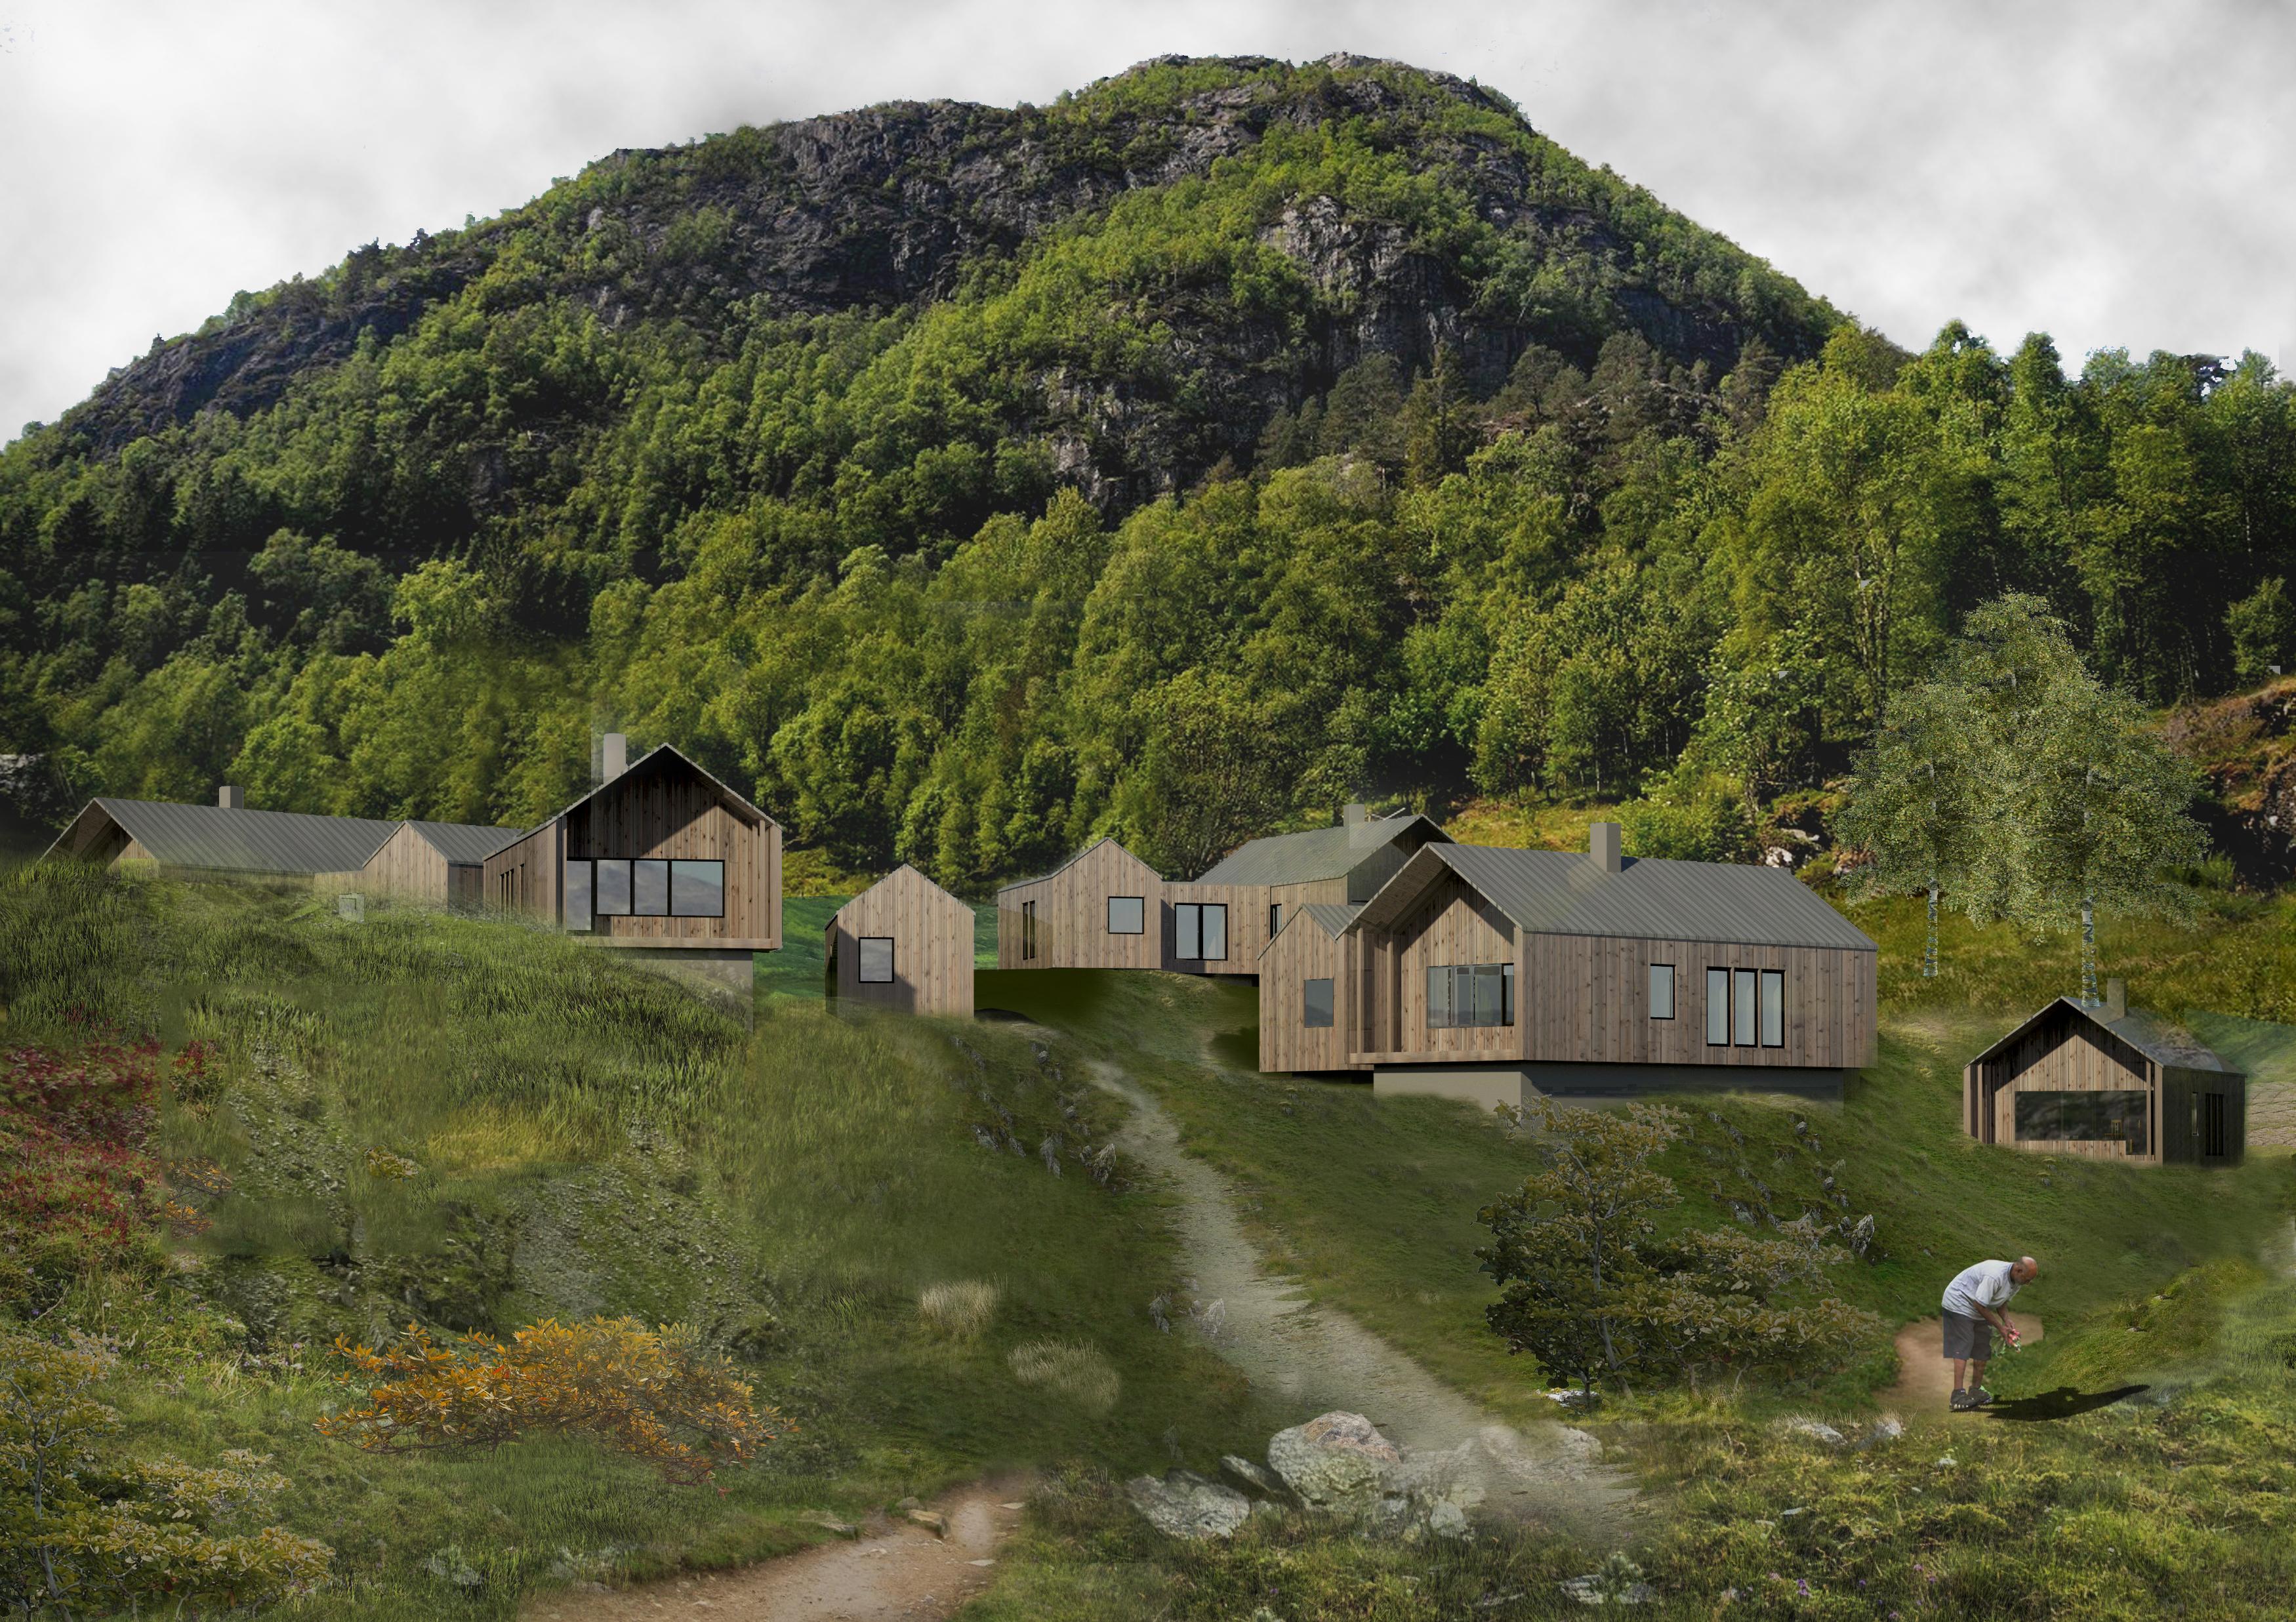 Mountain view houses